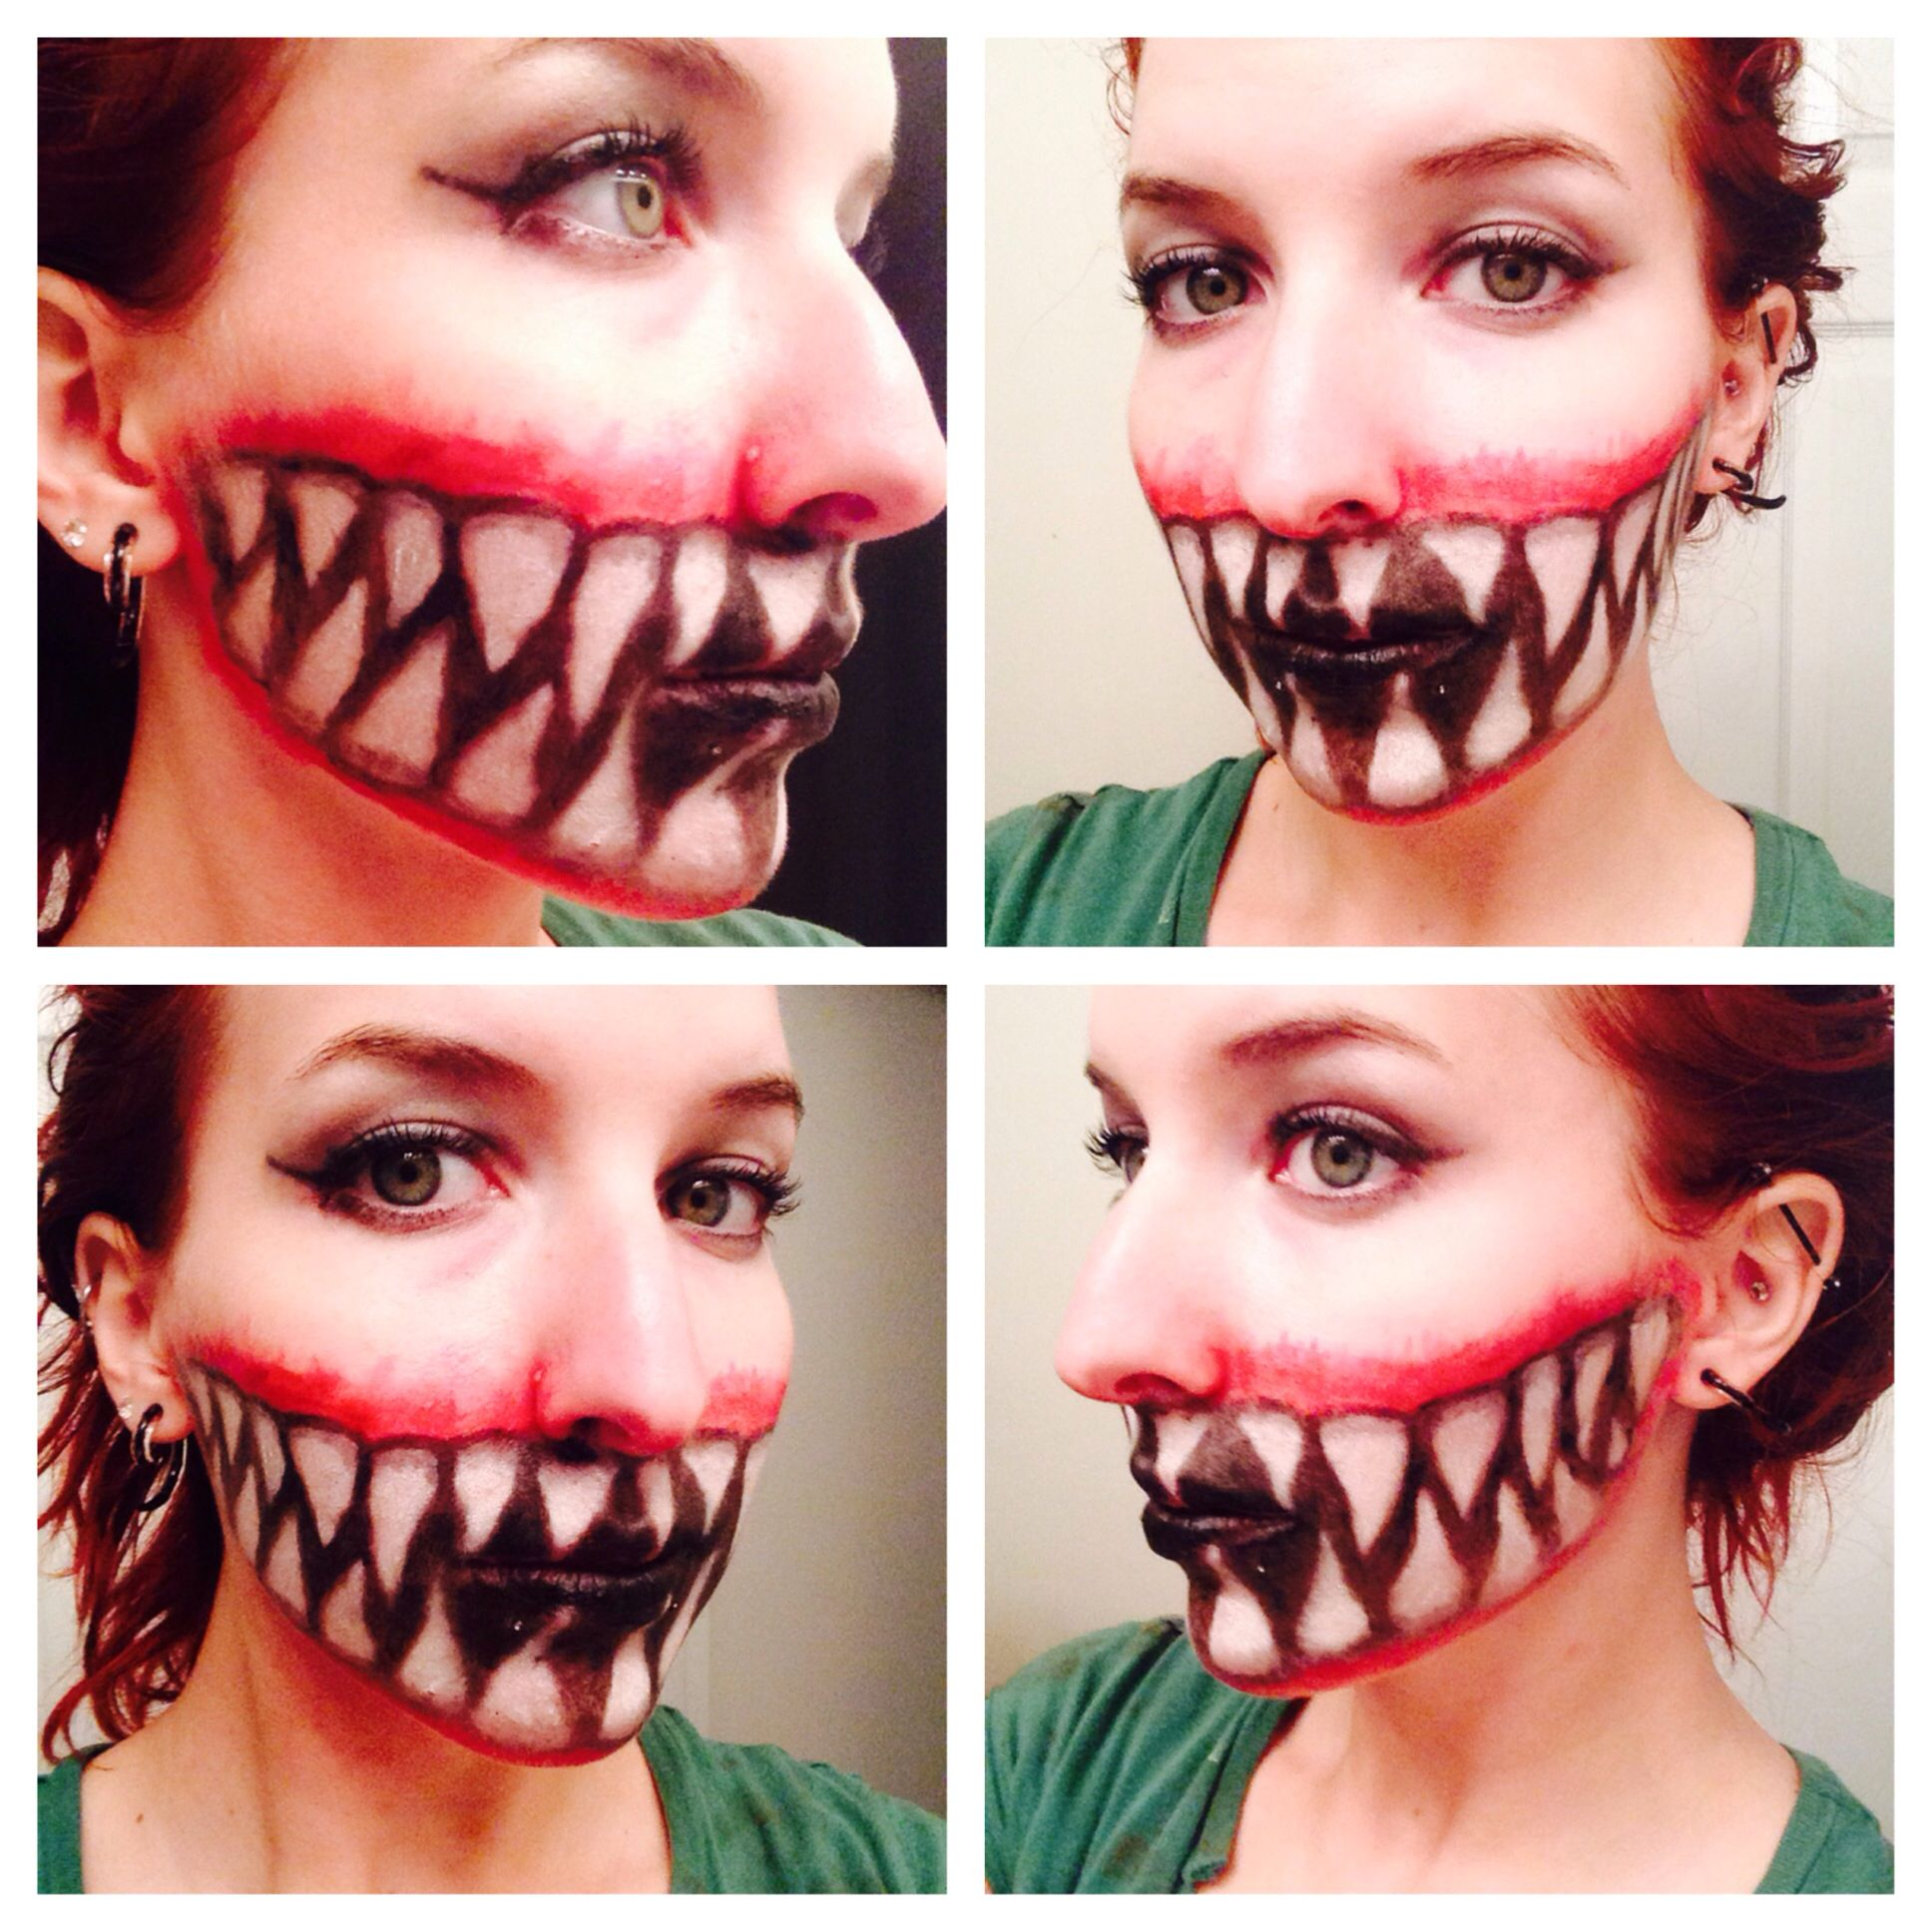 big scary halloween teeth face paint costume facepaint halloween teethfacepaint